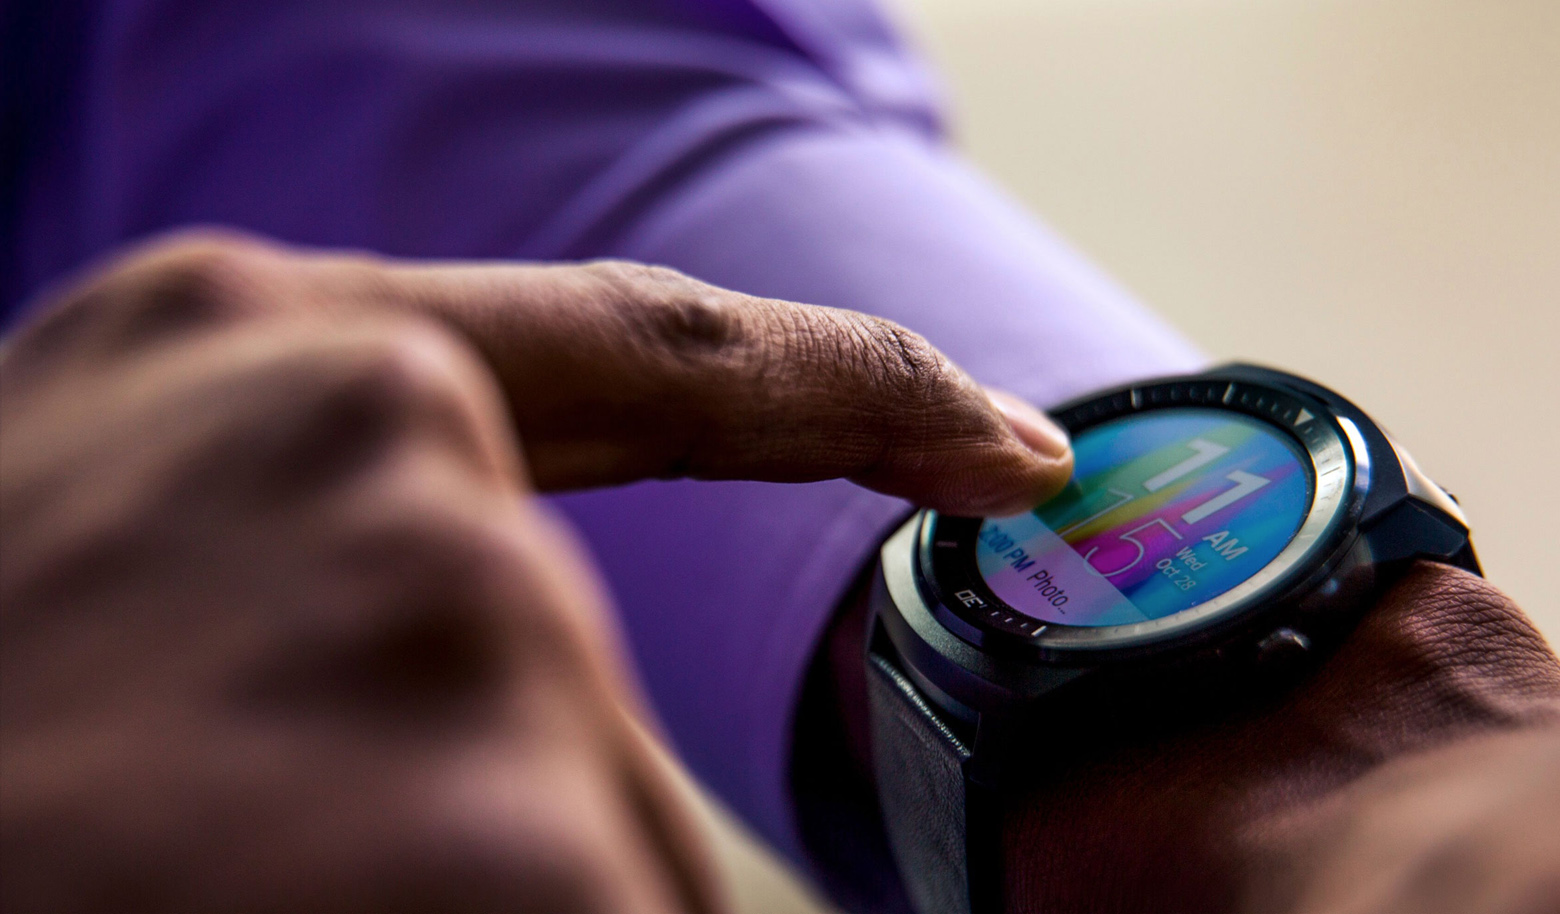 Synaptics wearable touchscreen